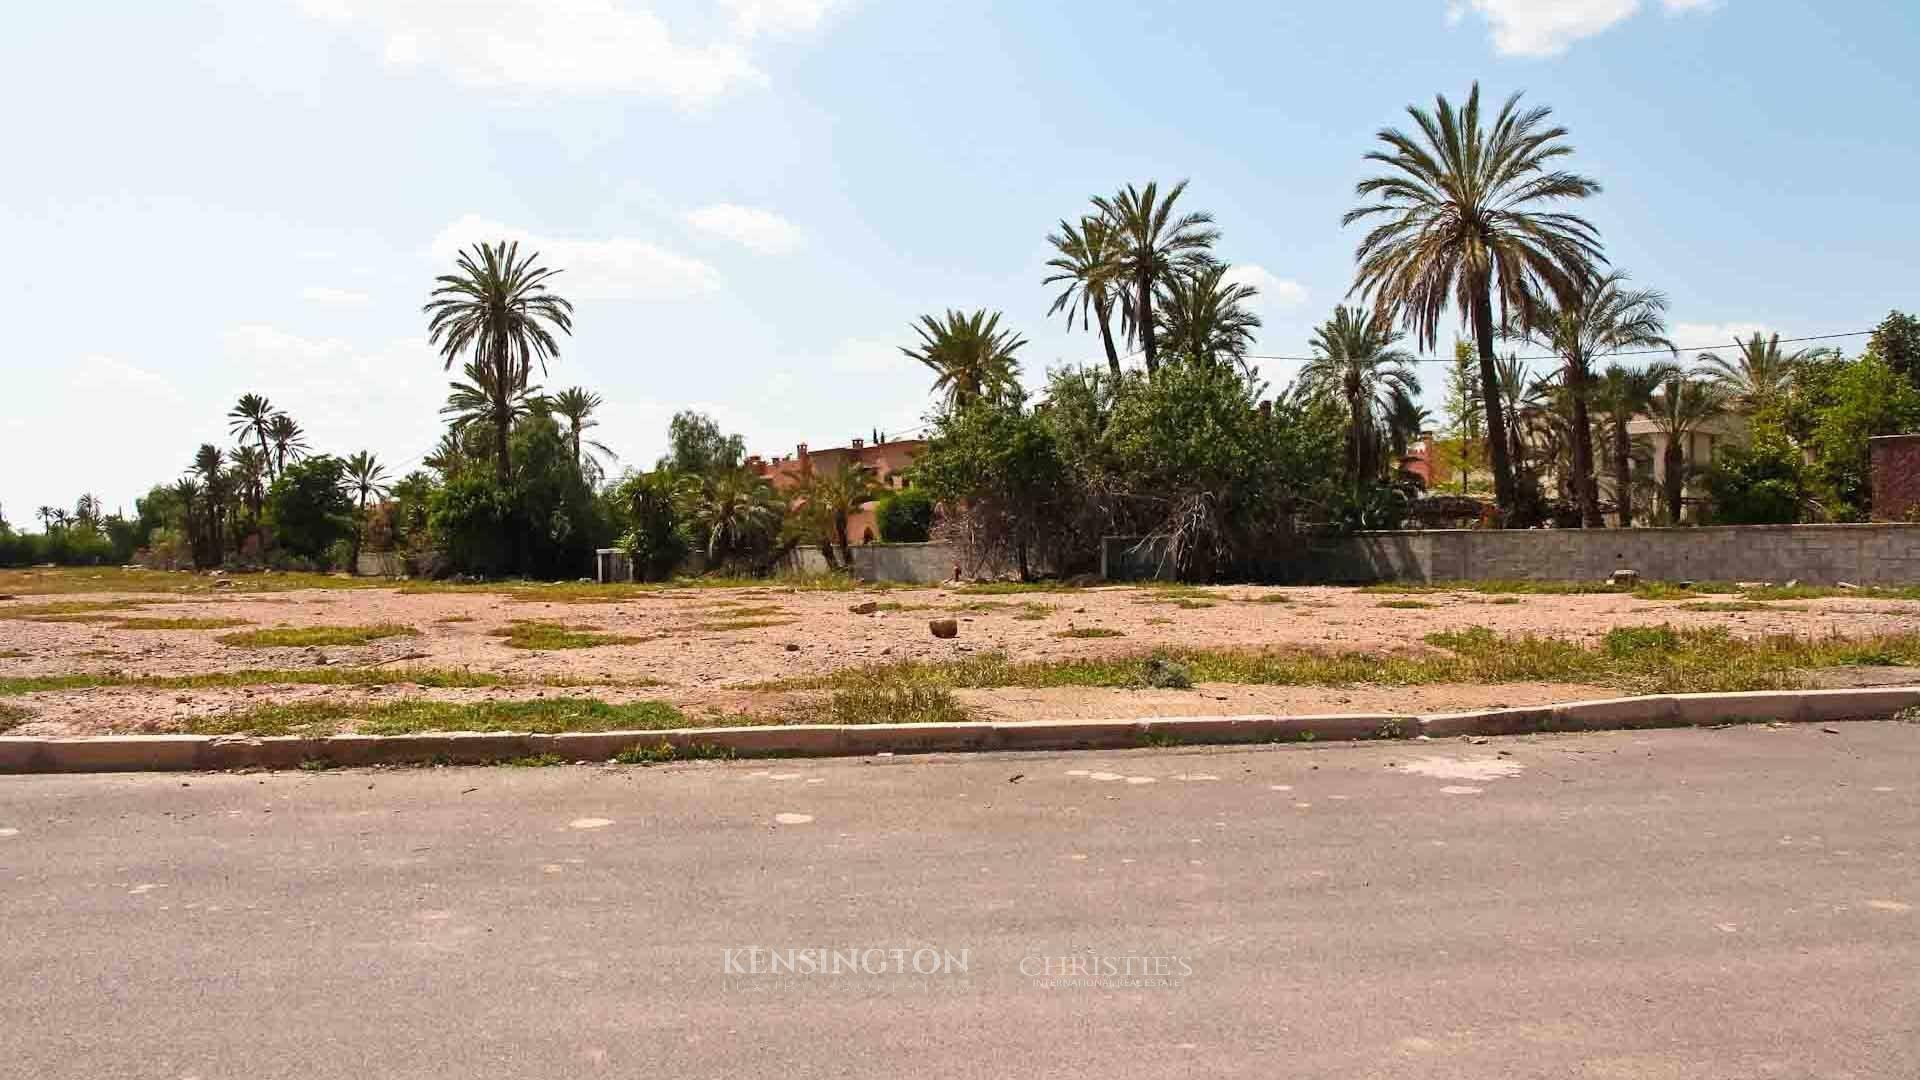 KPPM00990: Building Land Acamar Building land Marrakech Morocco